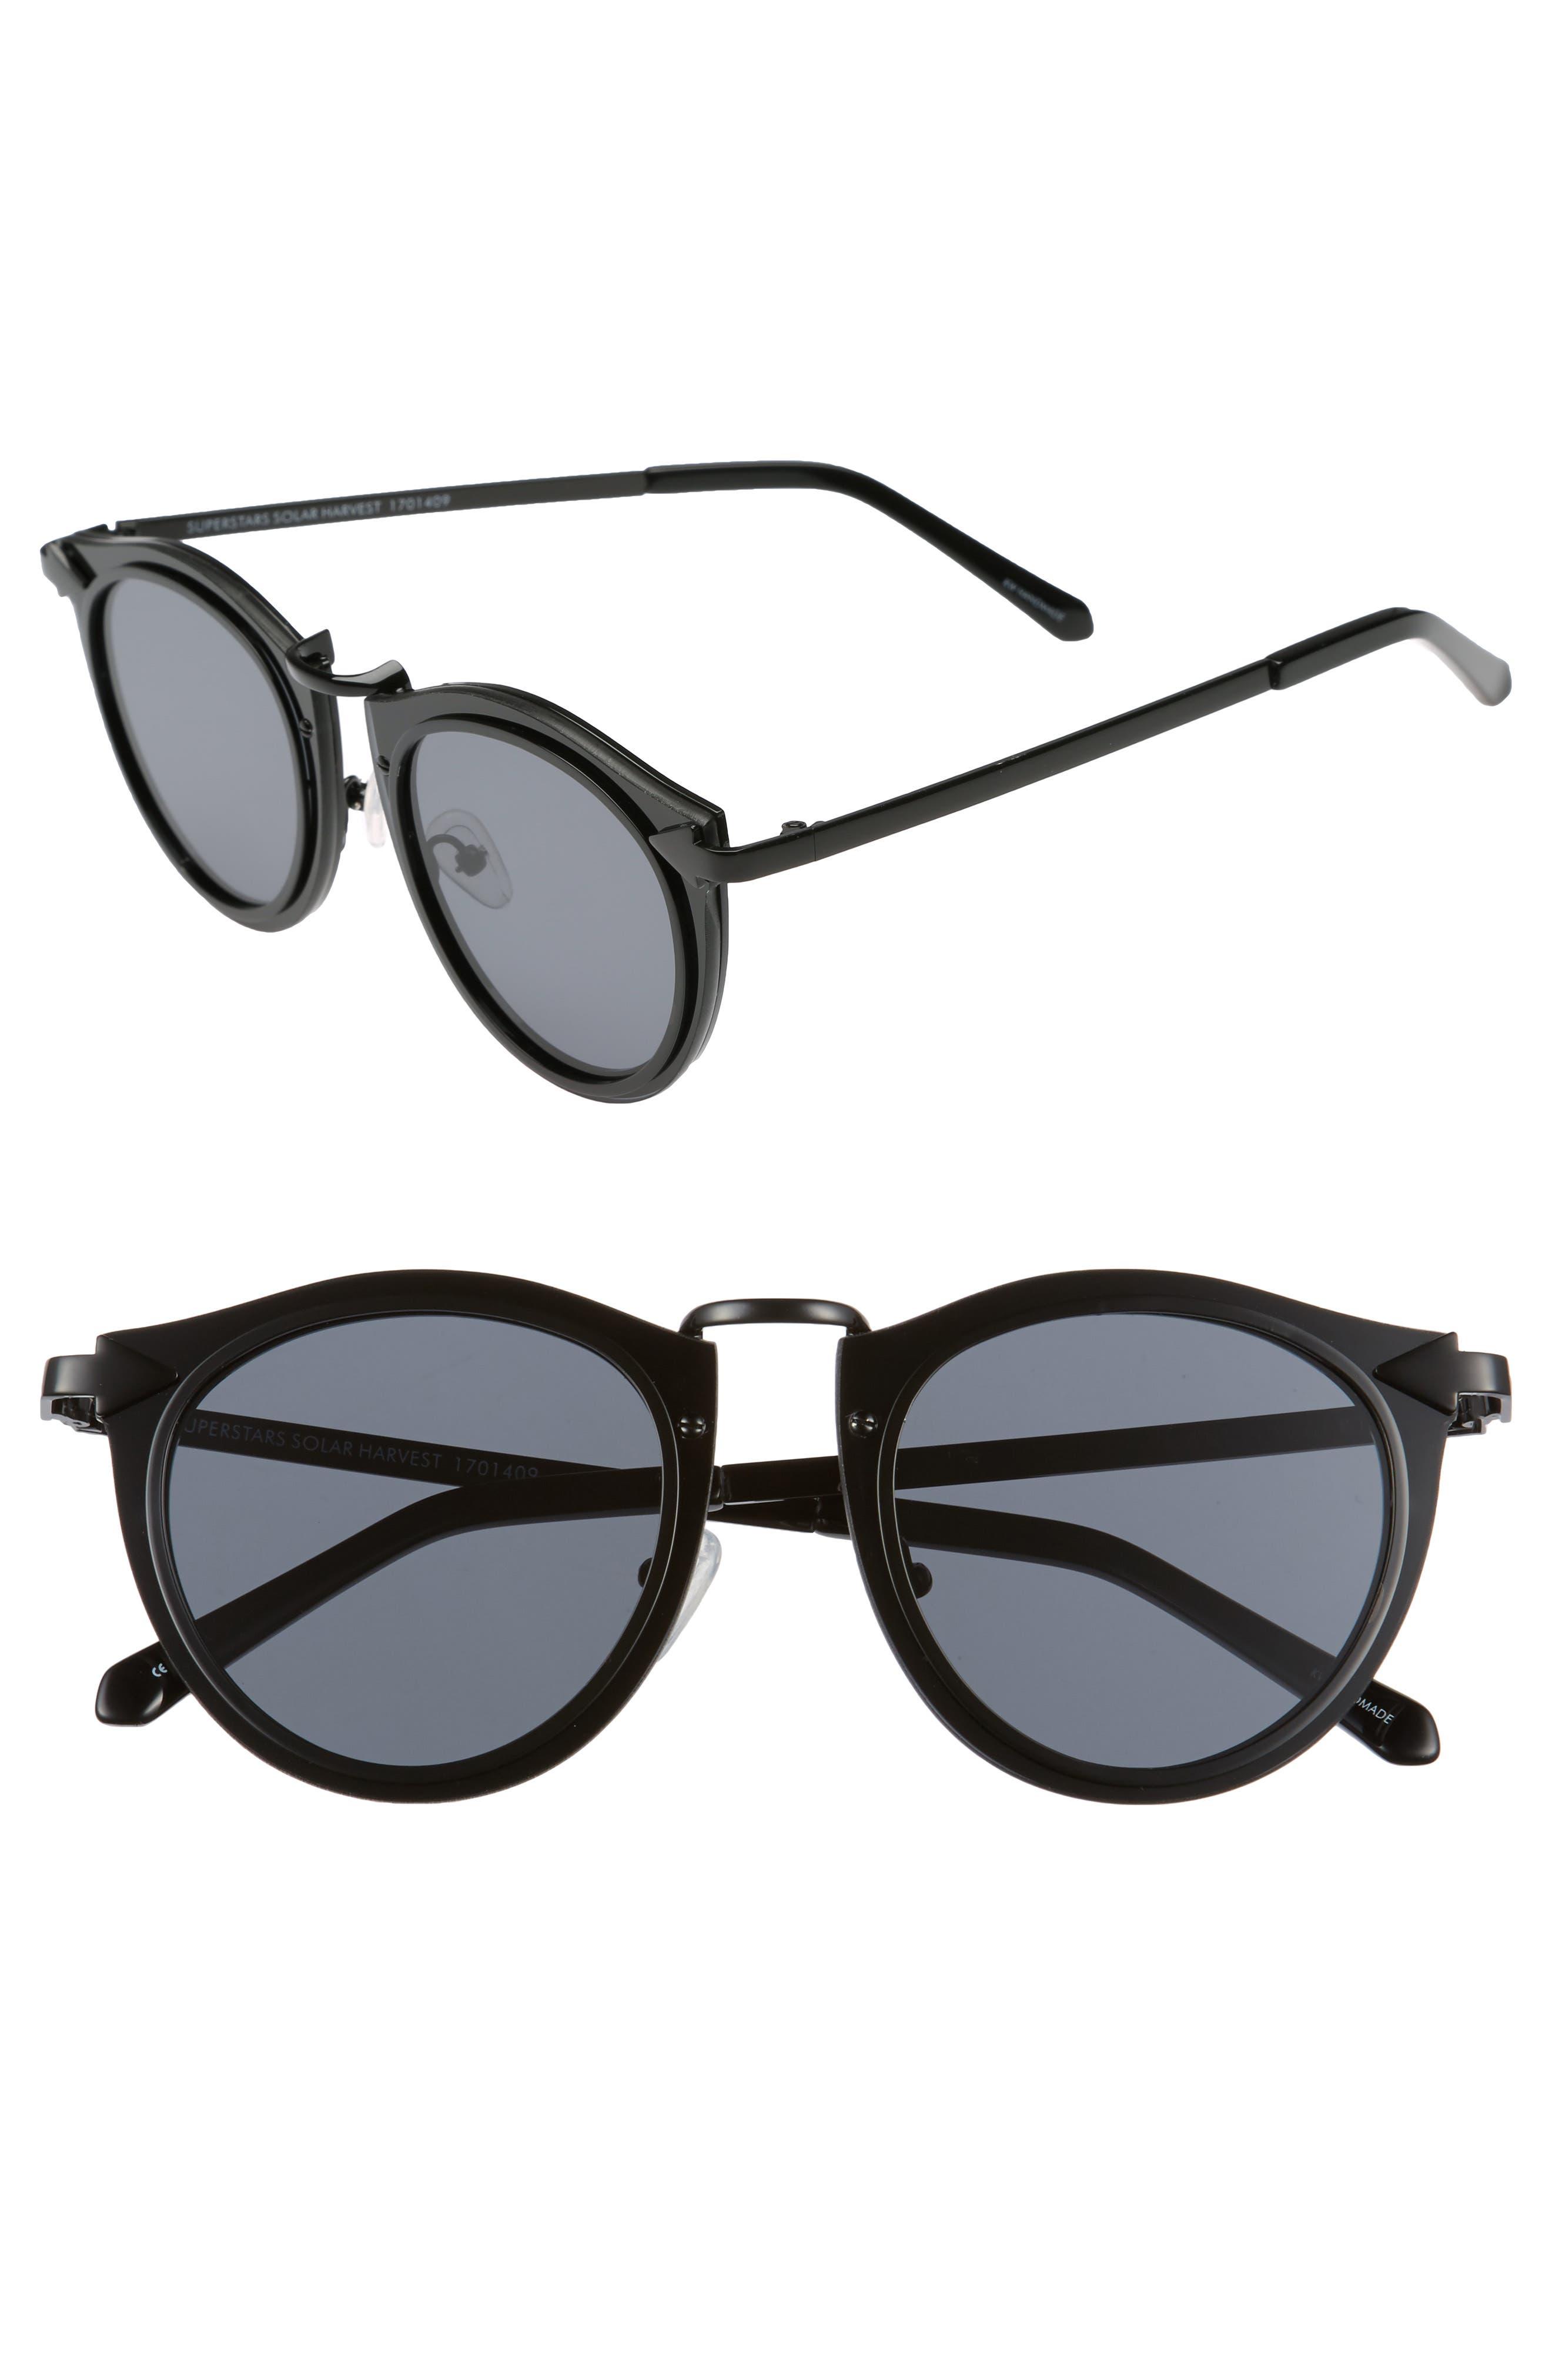 Superstars - Solar 50mm Retro Sunglasses,                             Main thumbnail 1, color,                             001